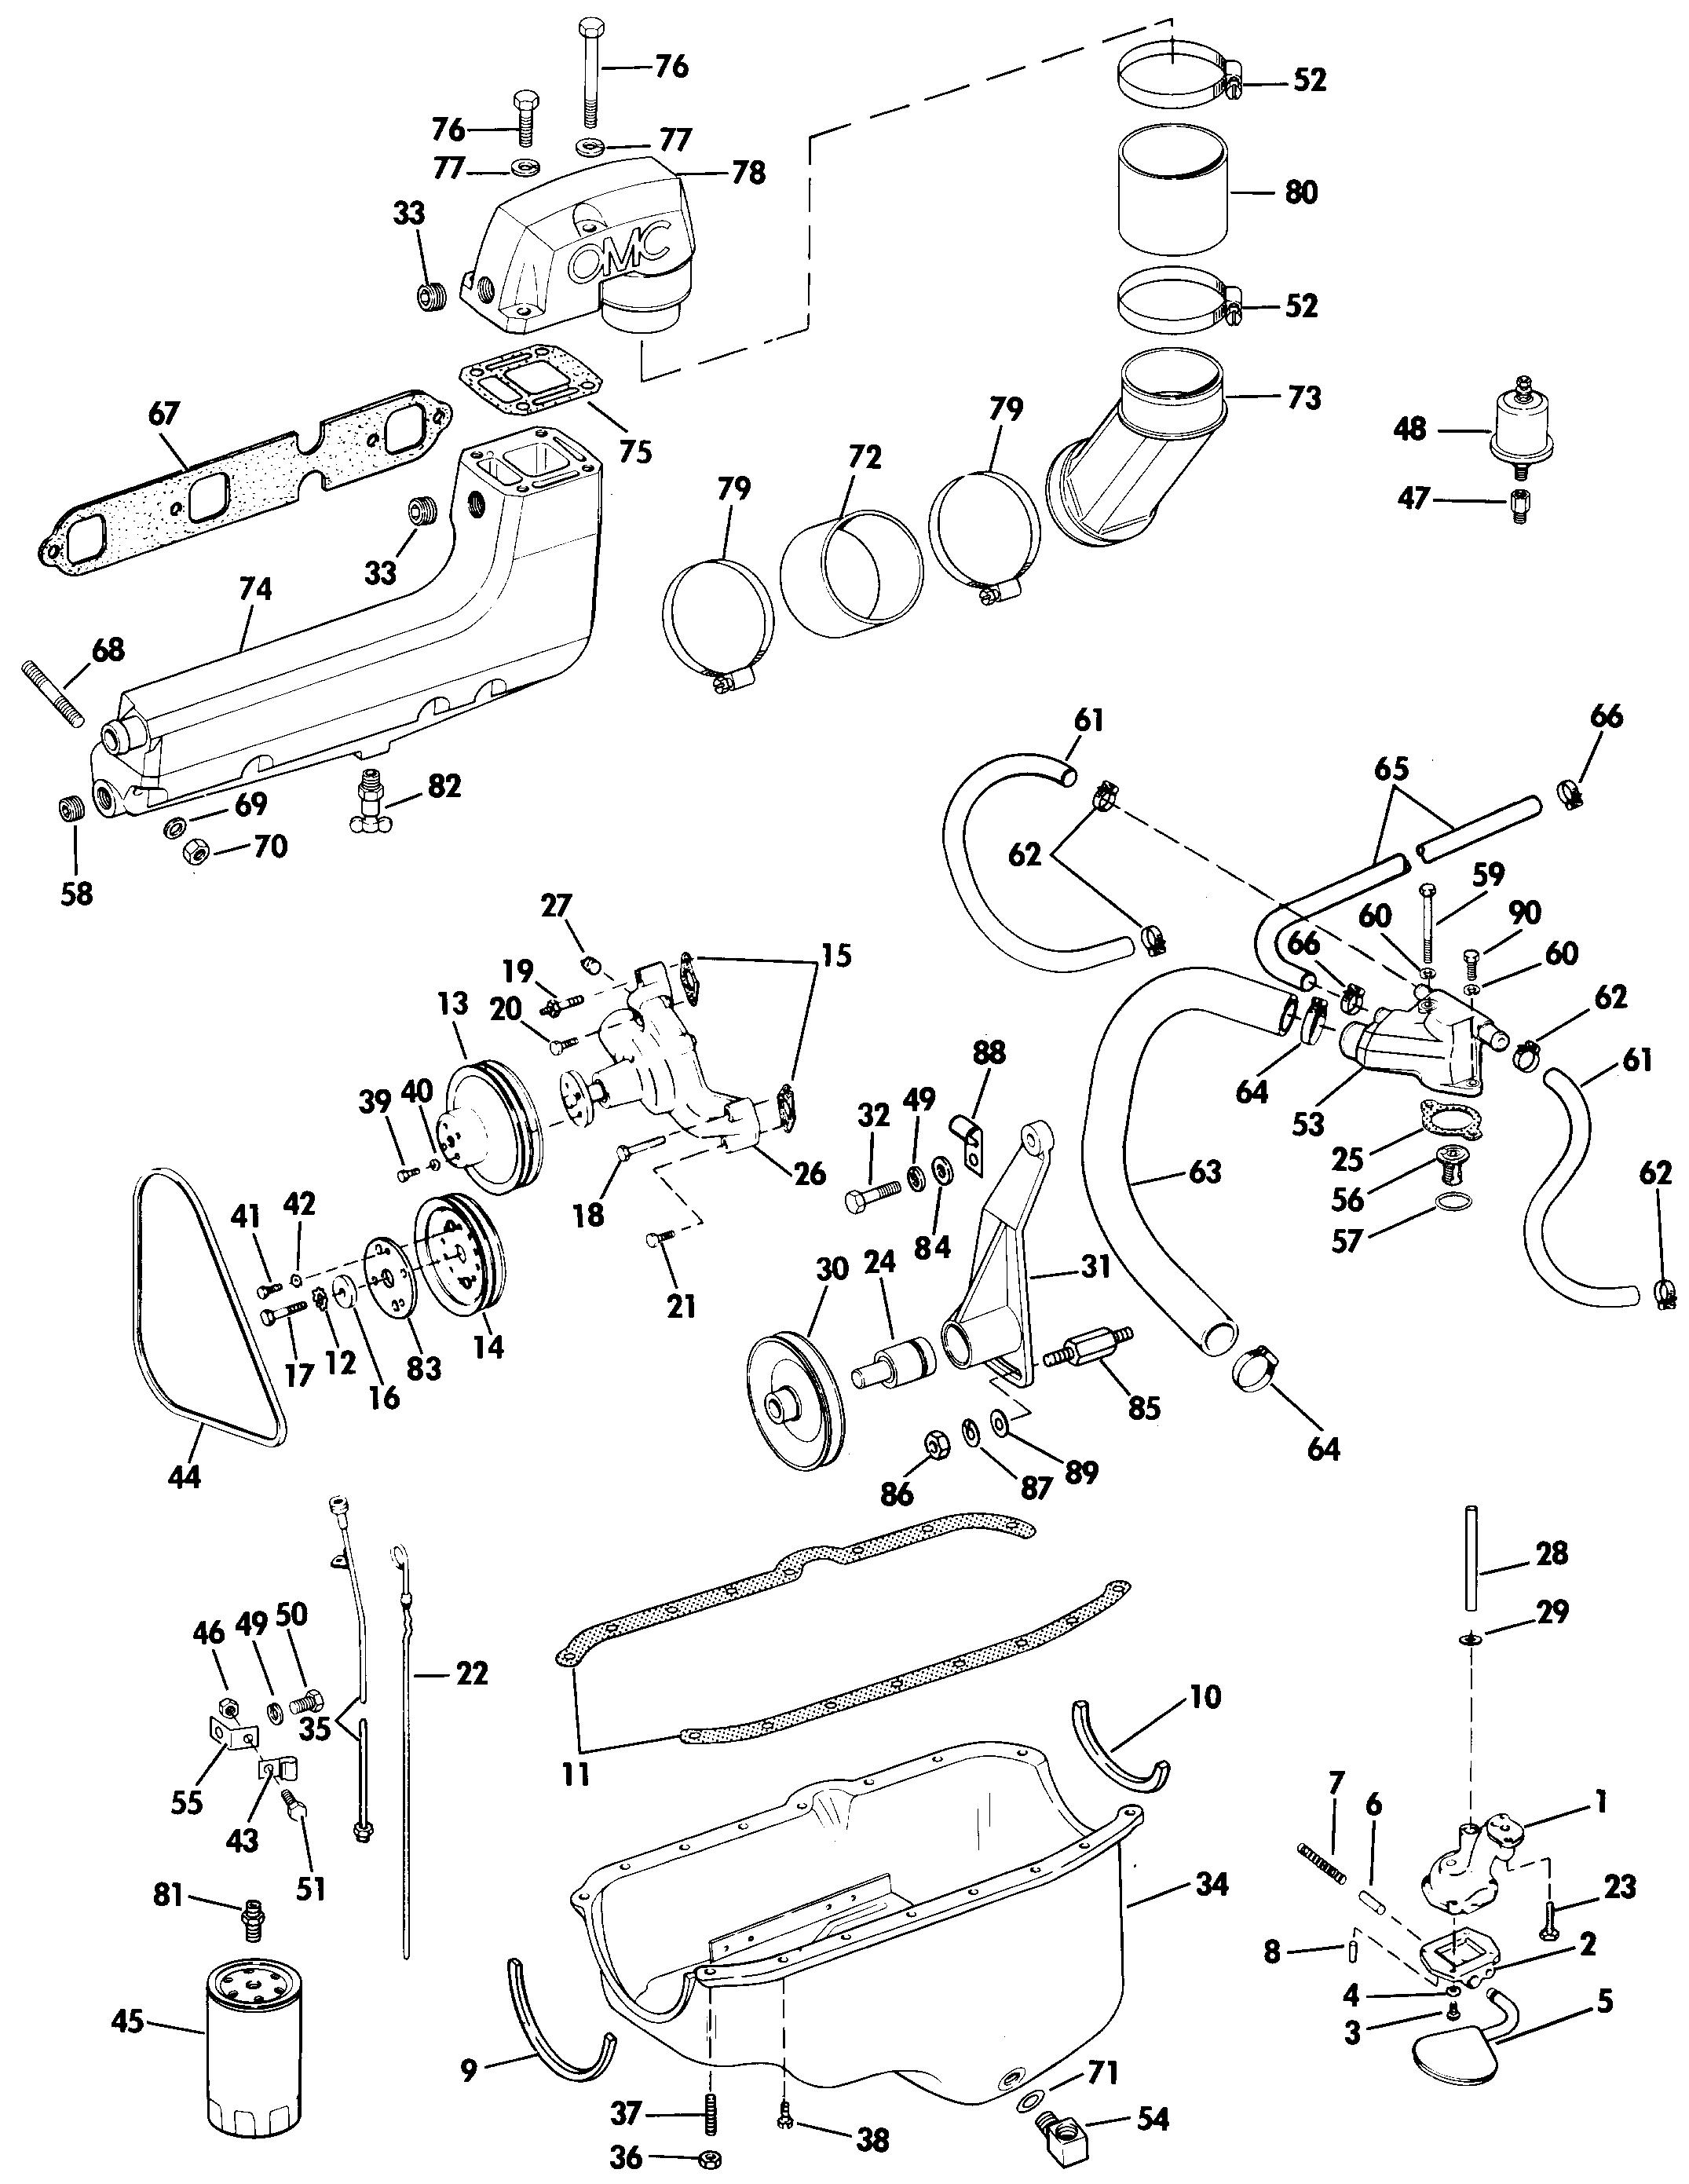 1985 johnson outboard motor parts impremedia